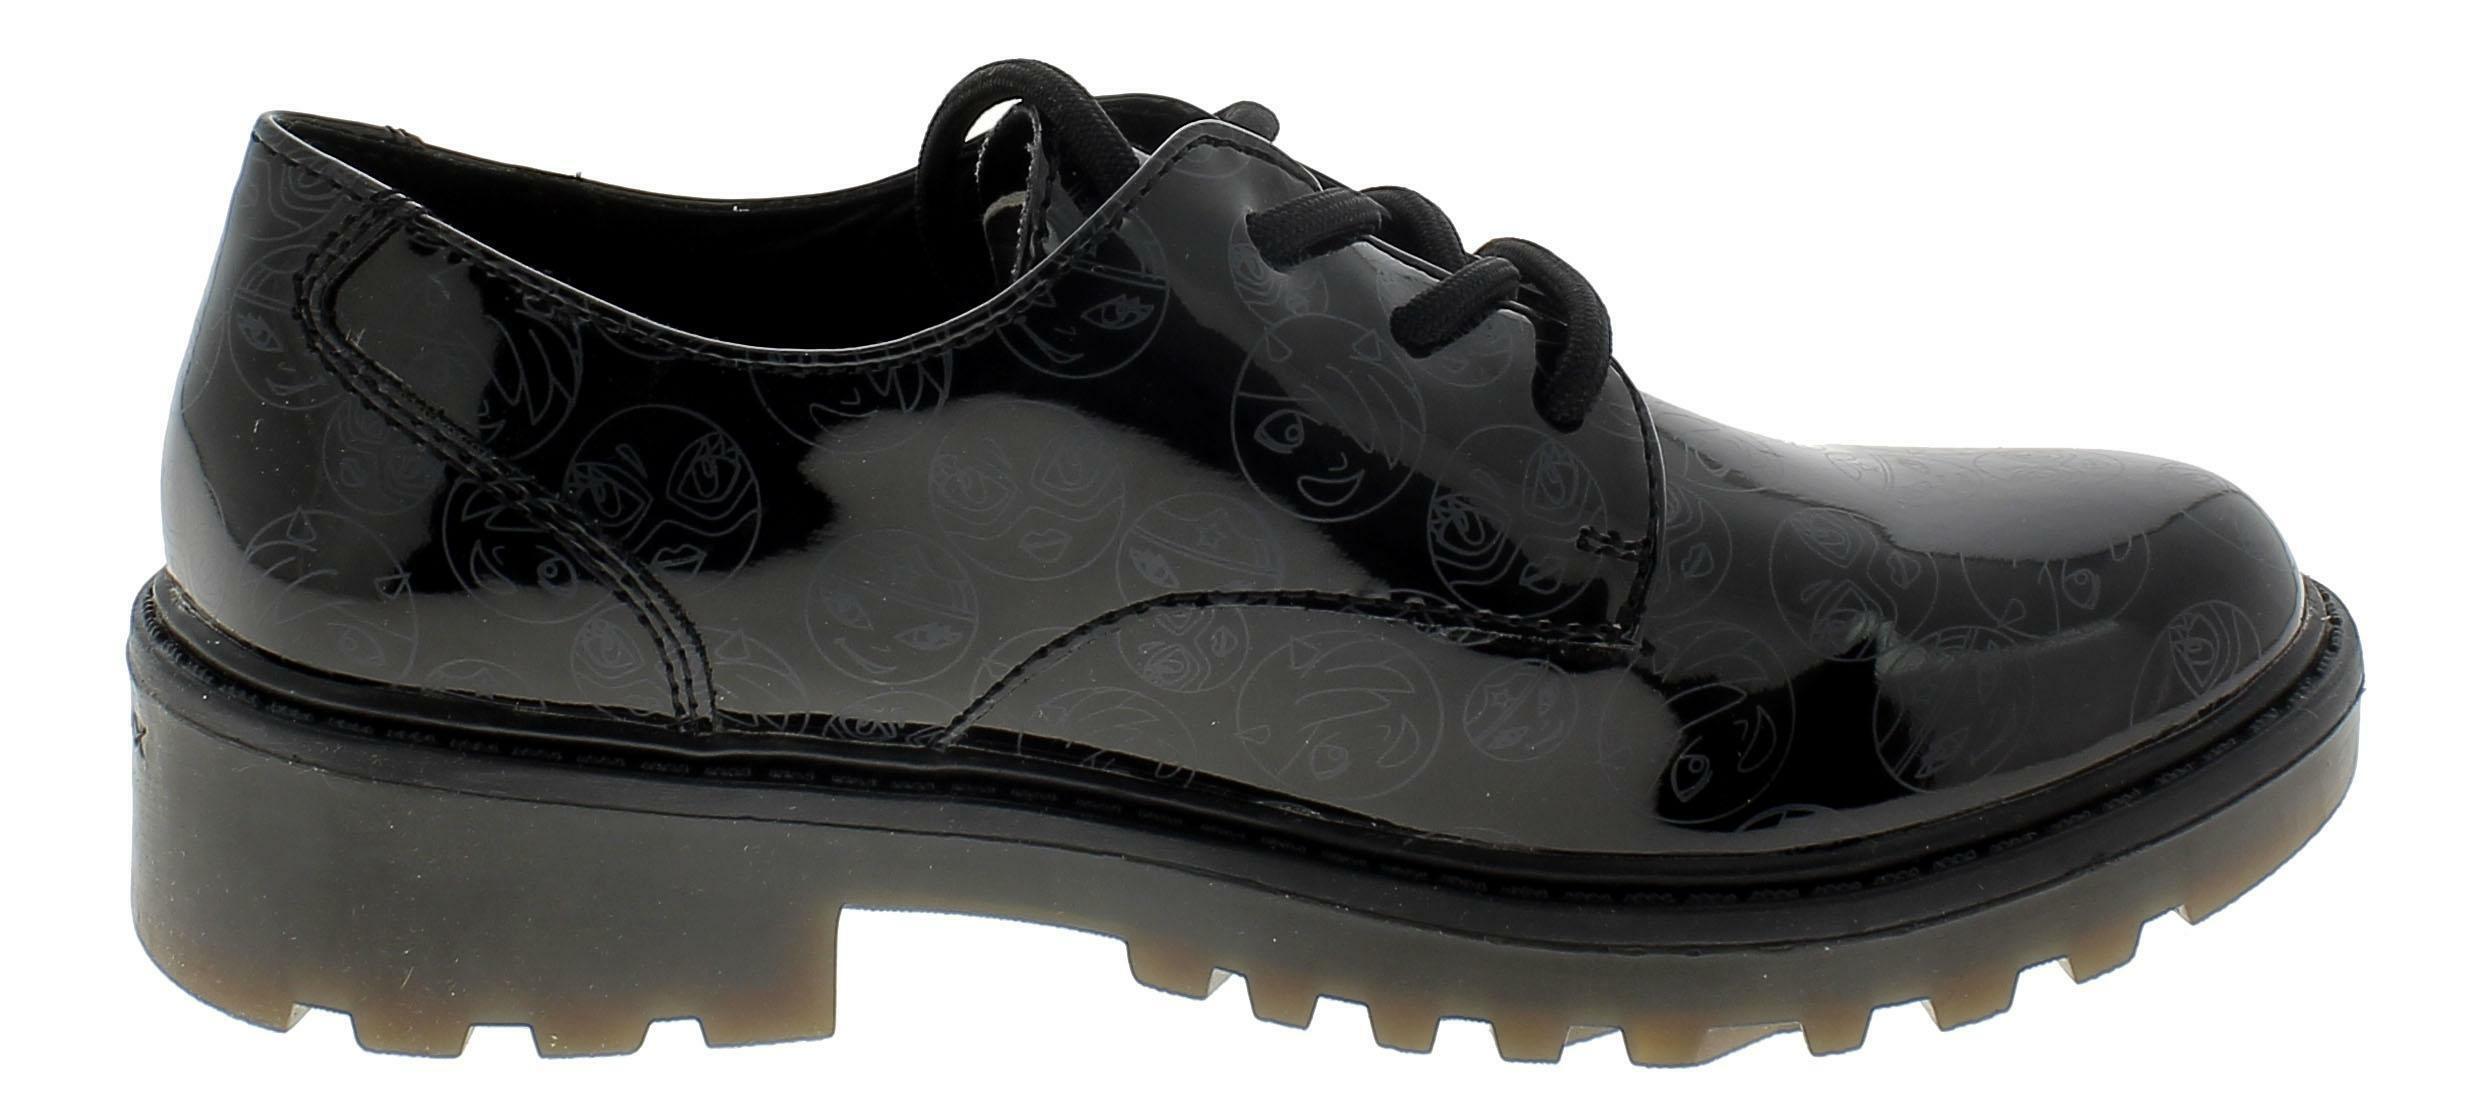 geox geox casey scarpe pelle fantasia nere